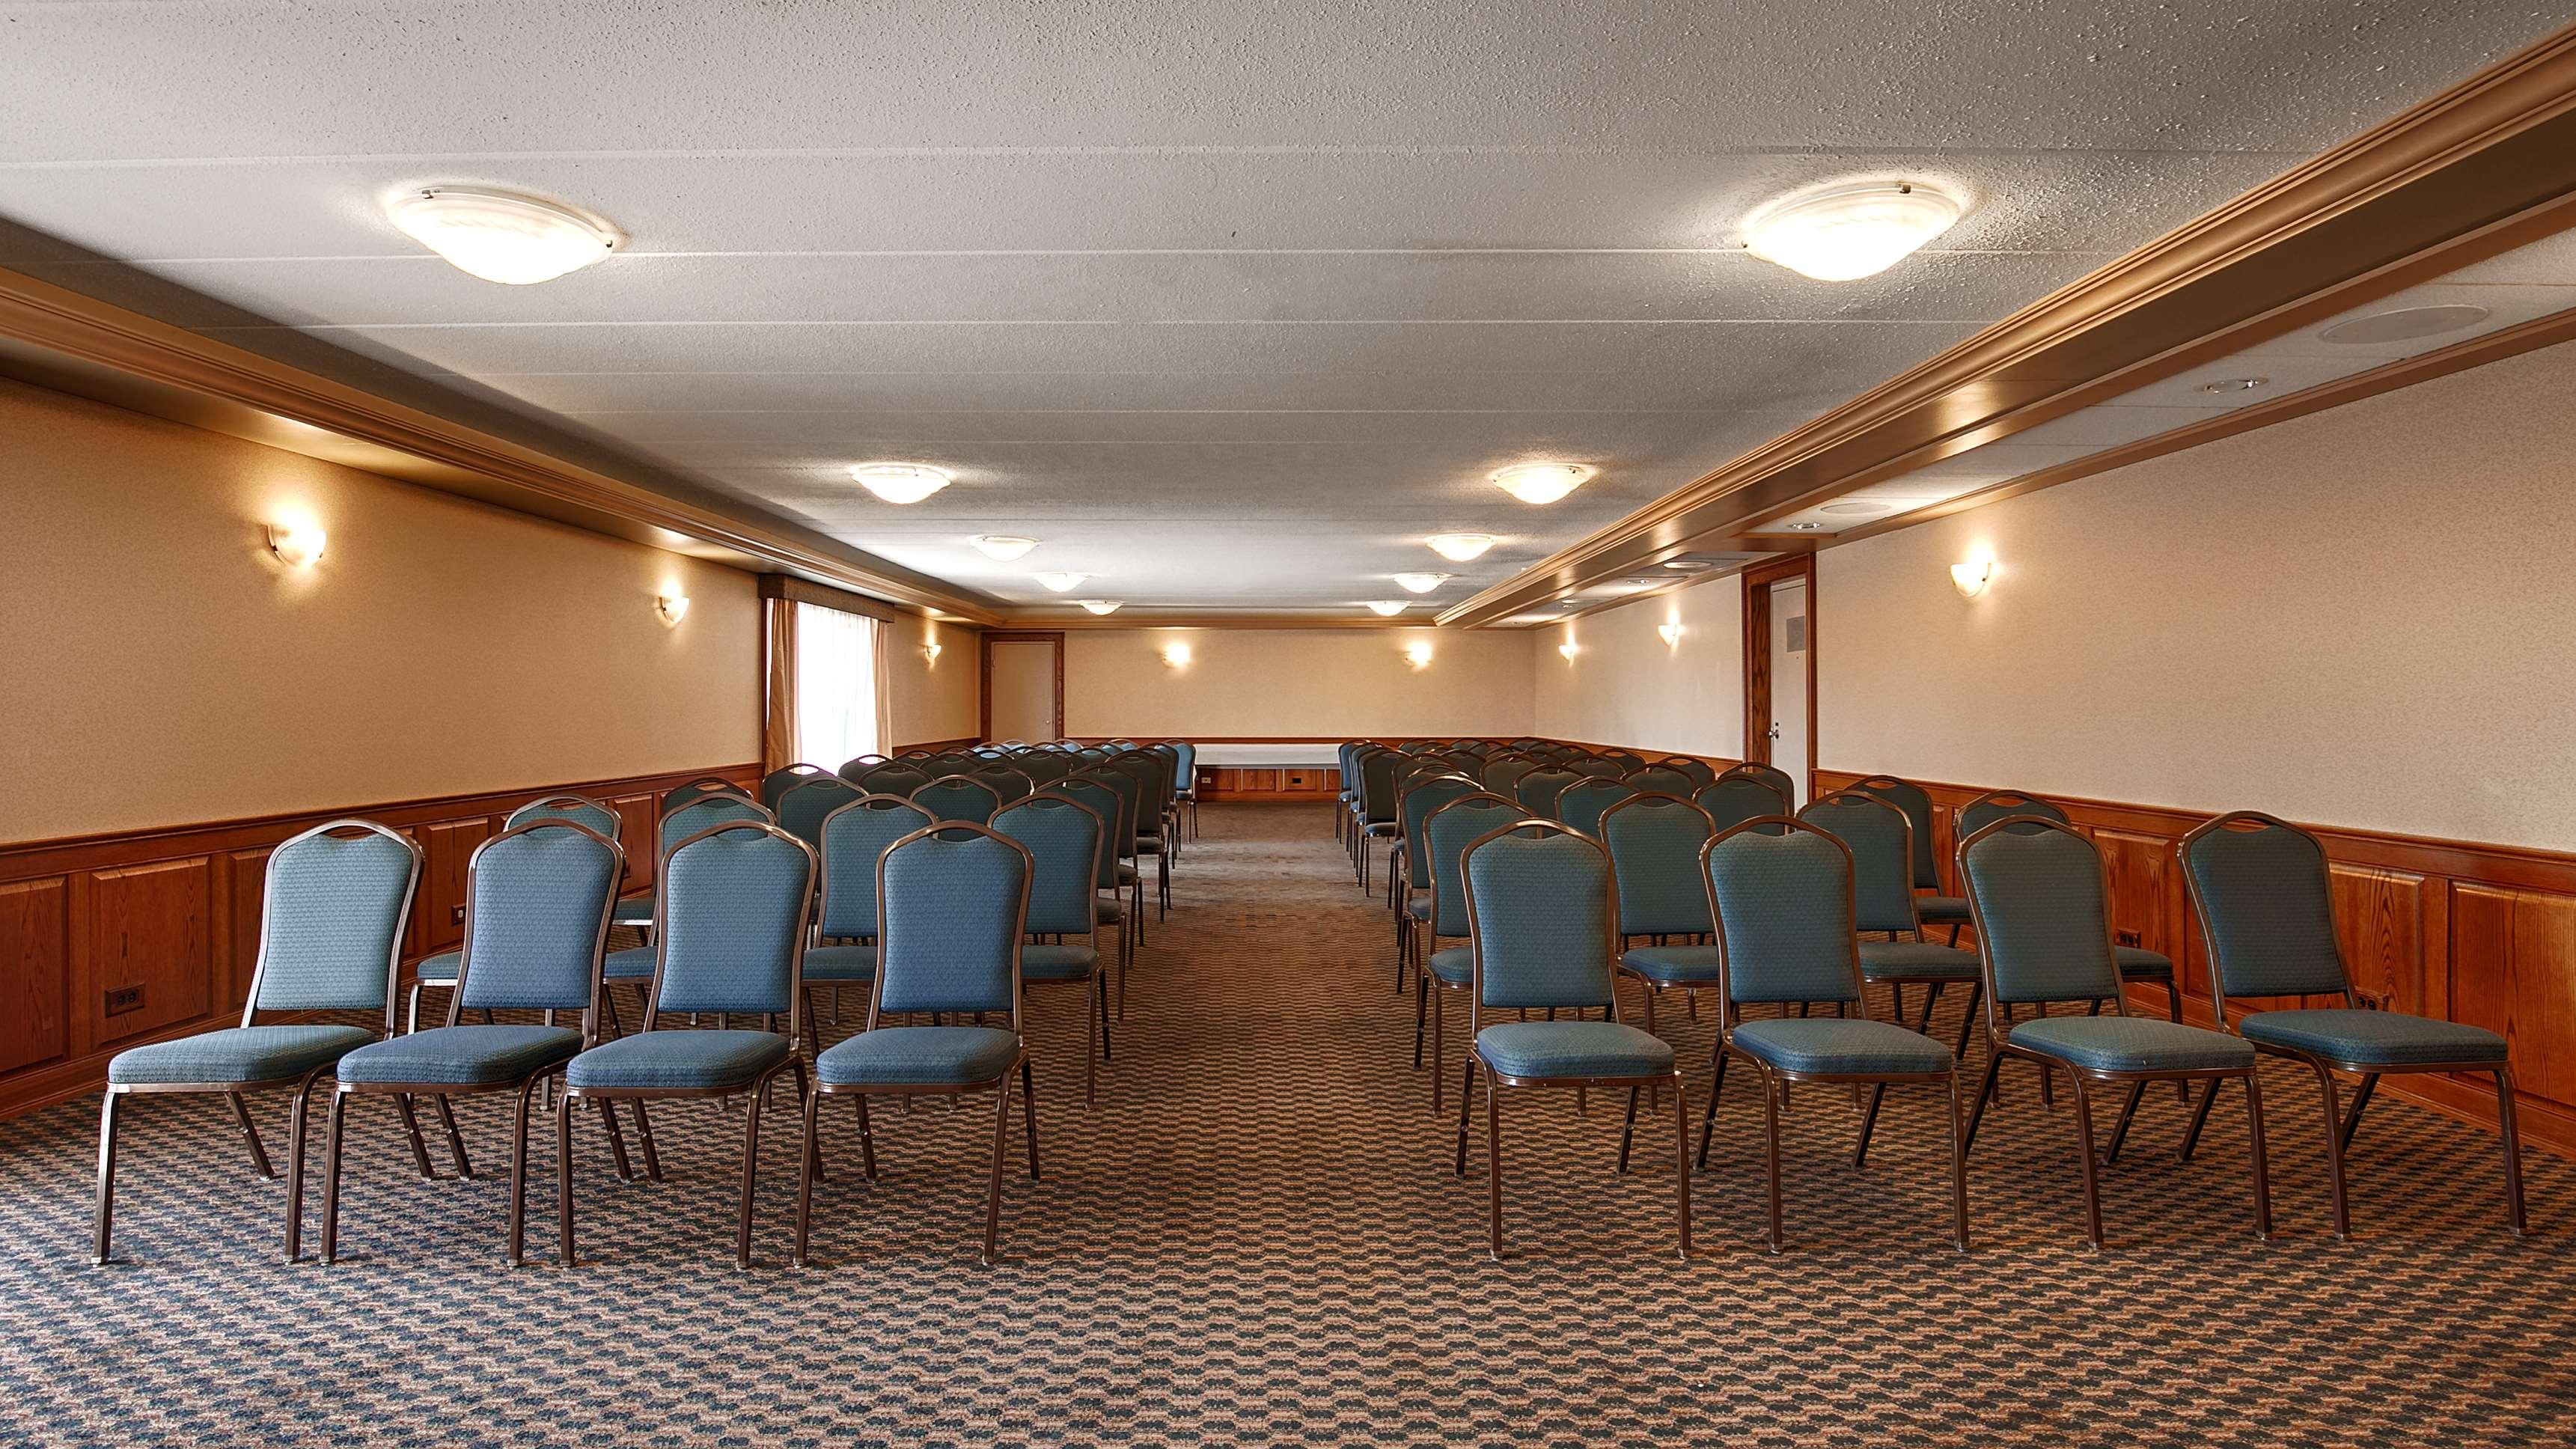 Best Western Valley Plaza Inn image 33